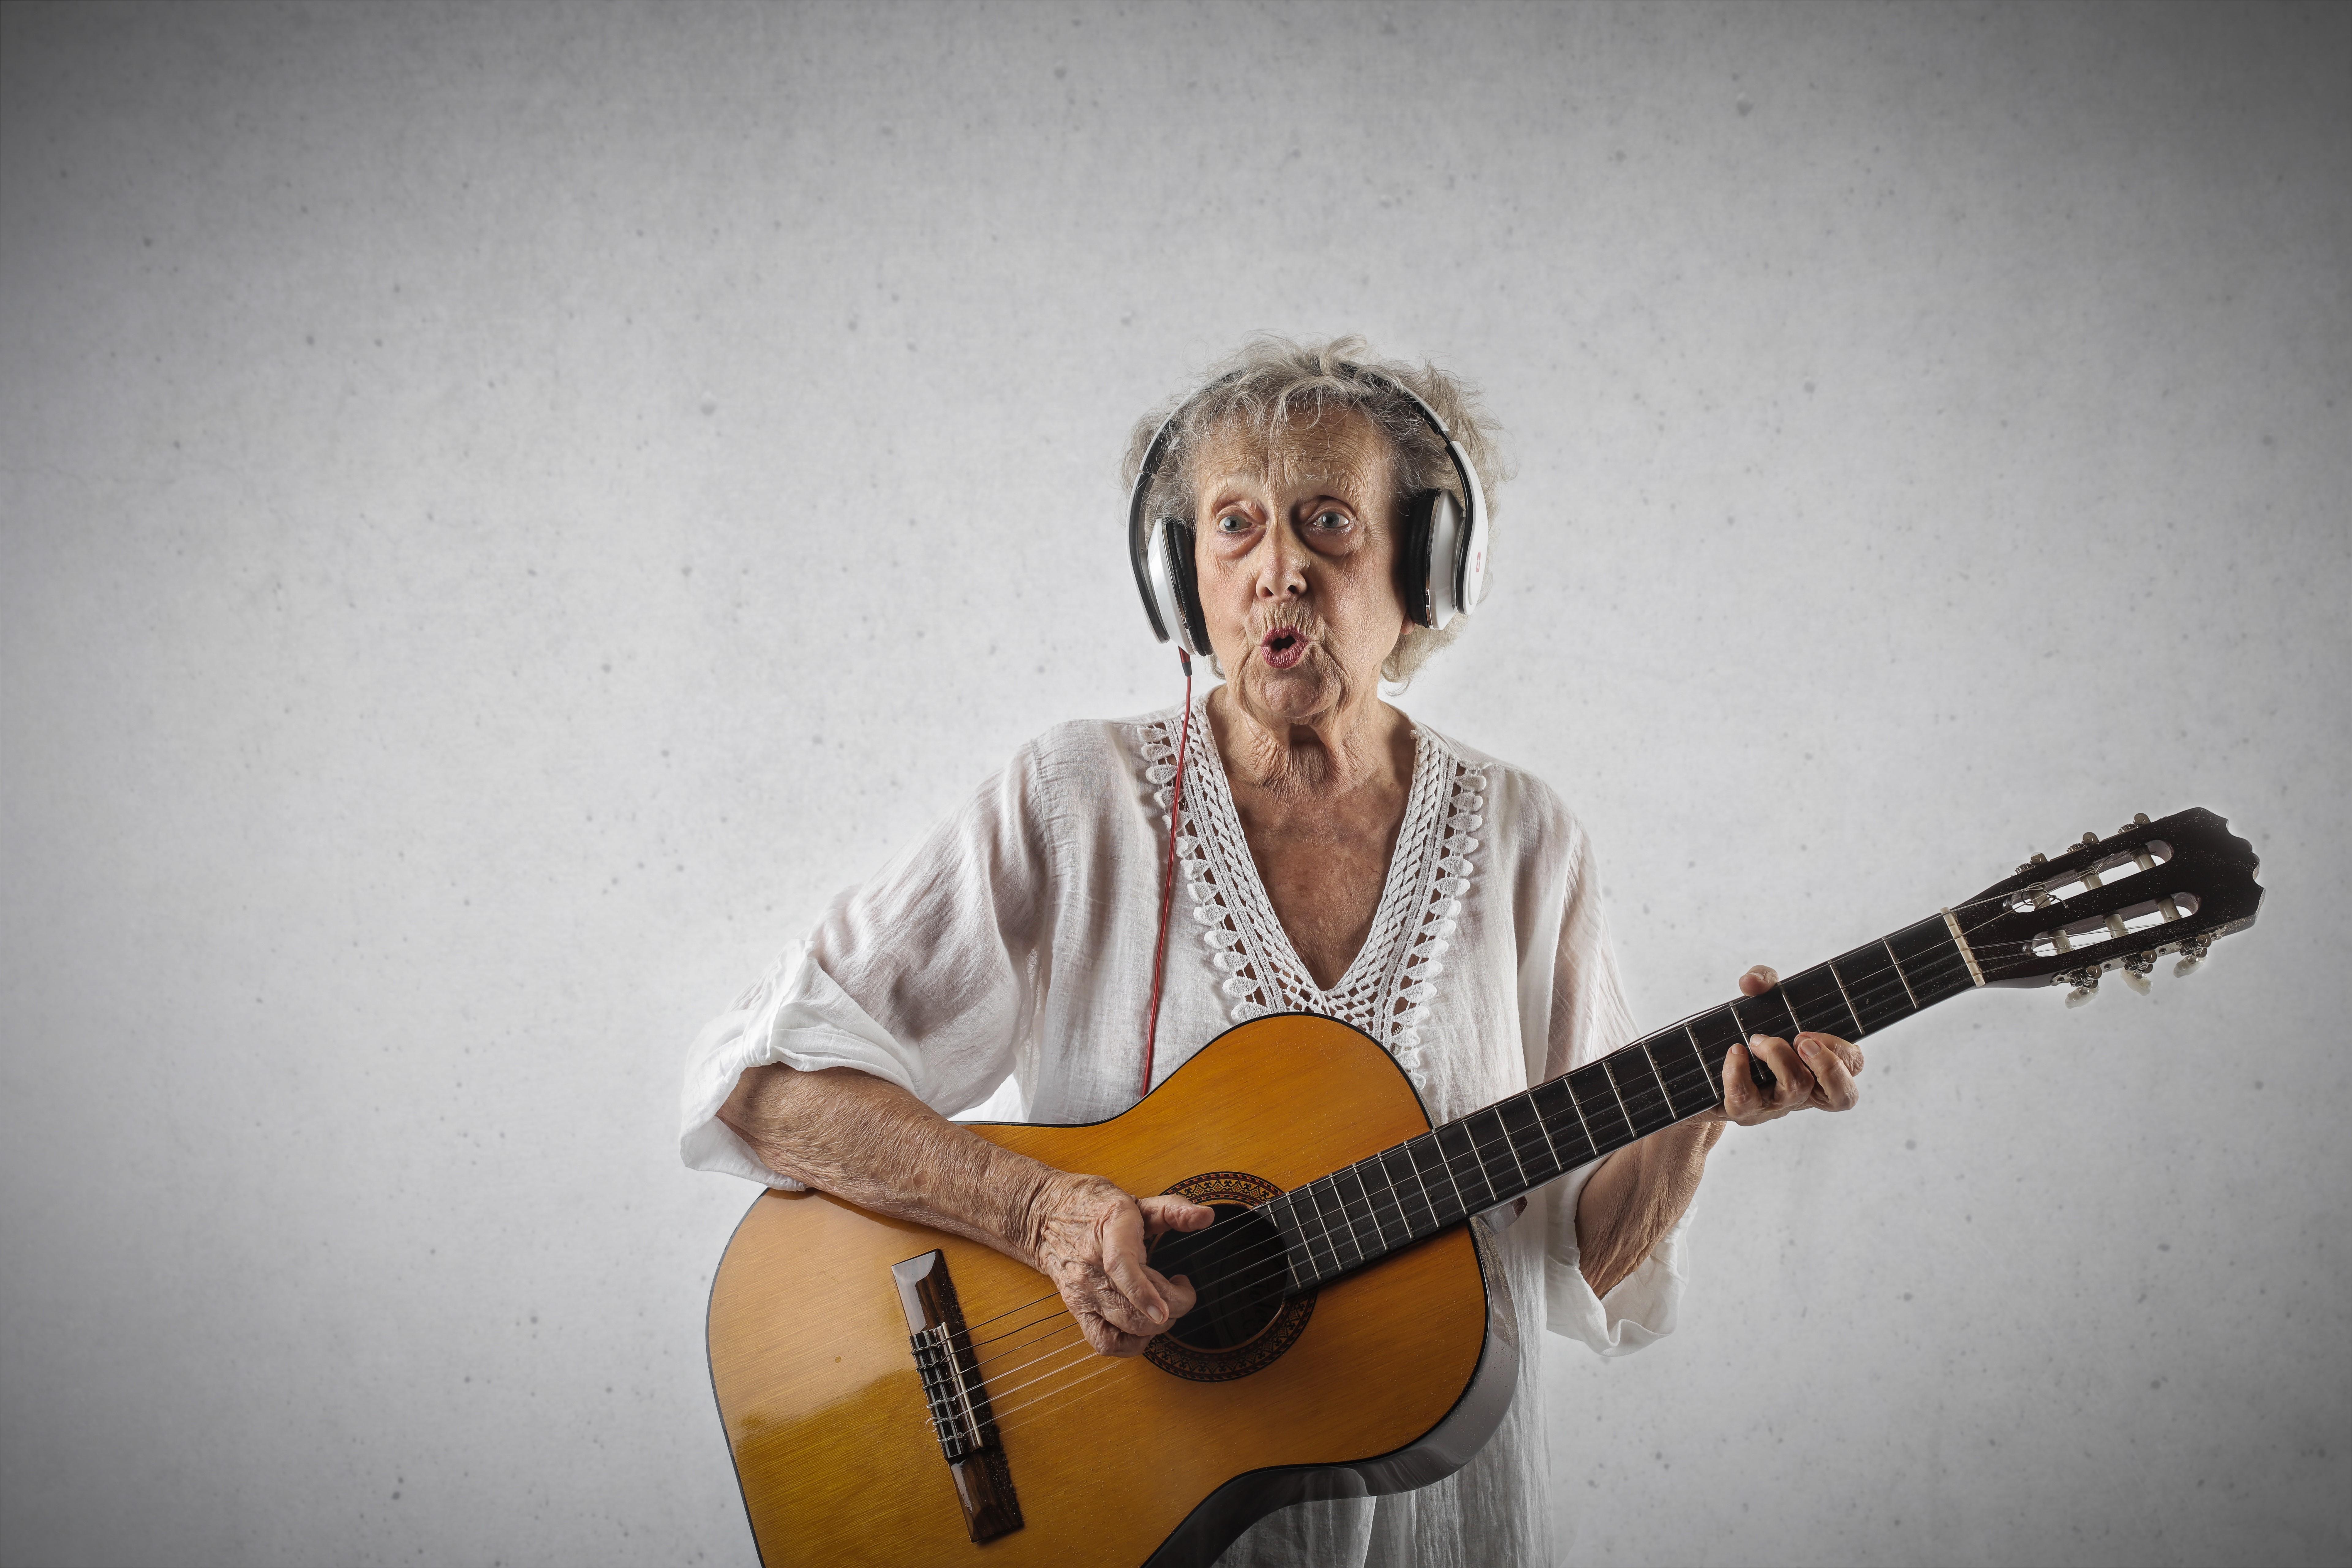 Rock grandma